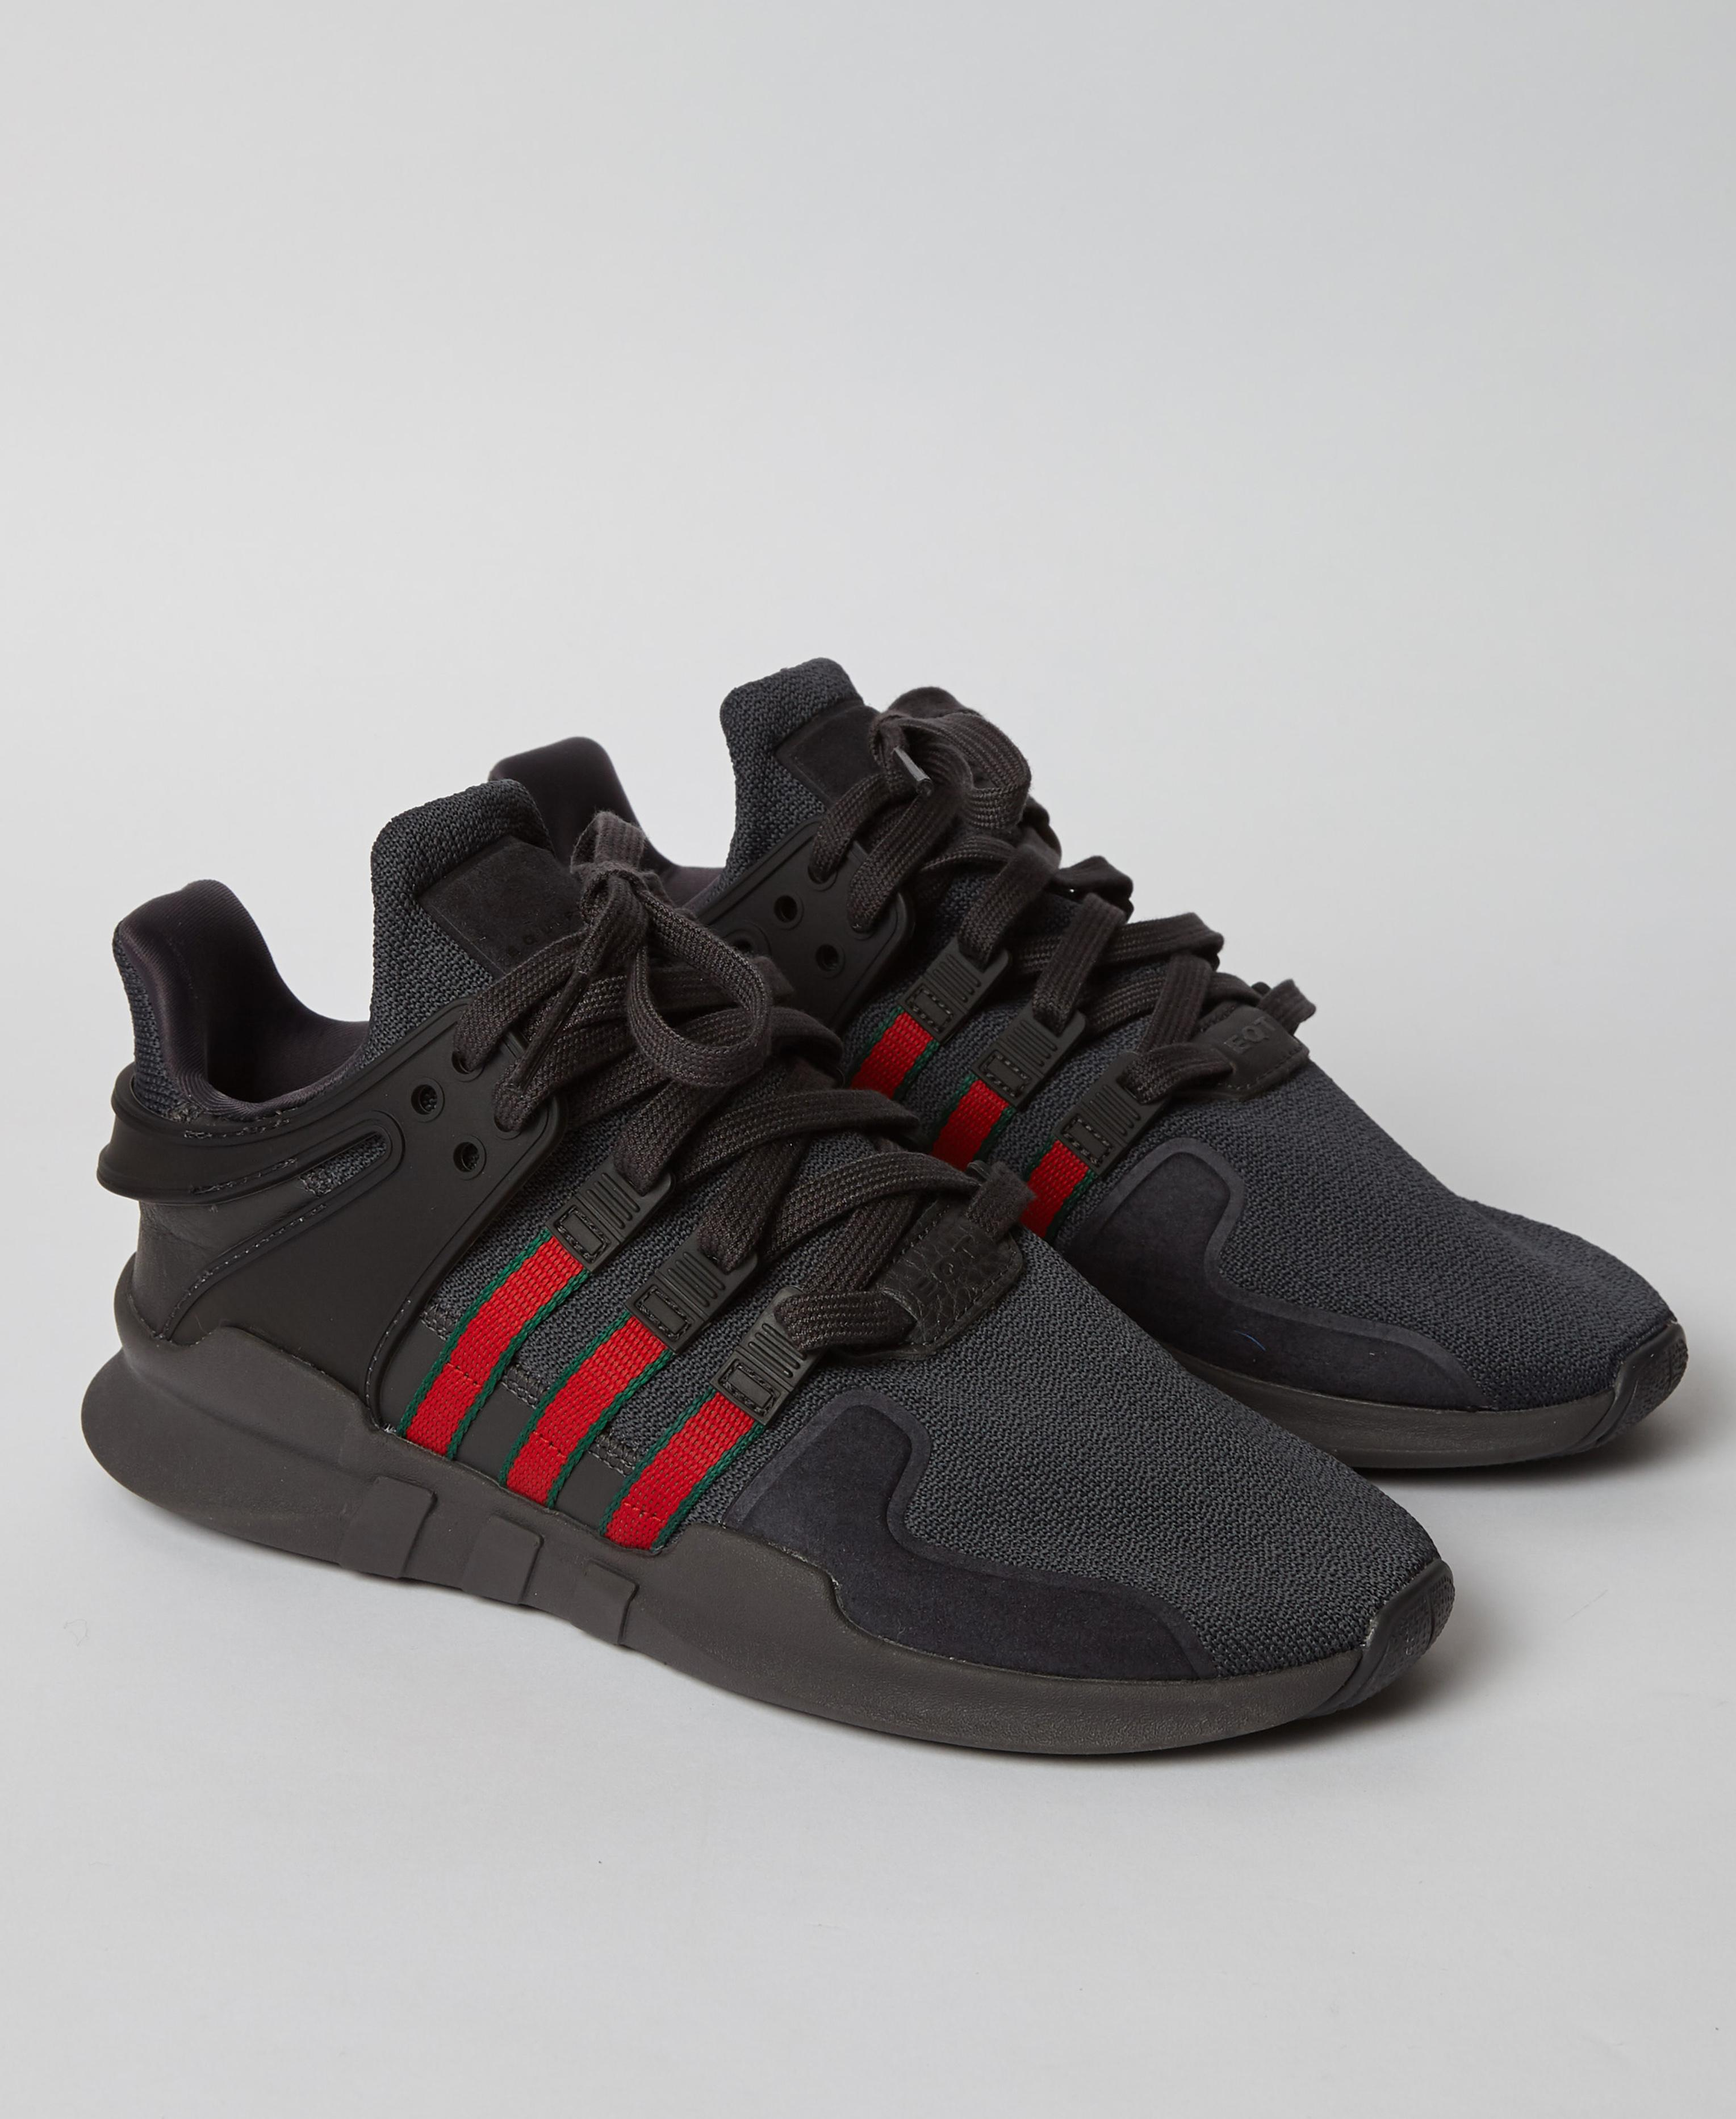 best service 6c2e1 3cf7d Adidas Black Eqt Support Adv